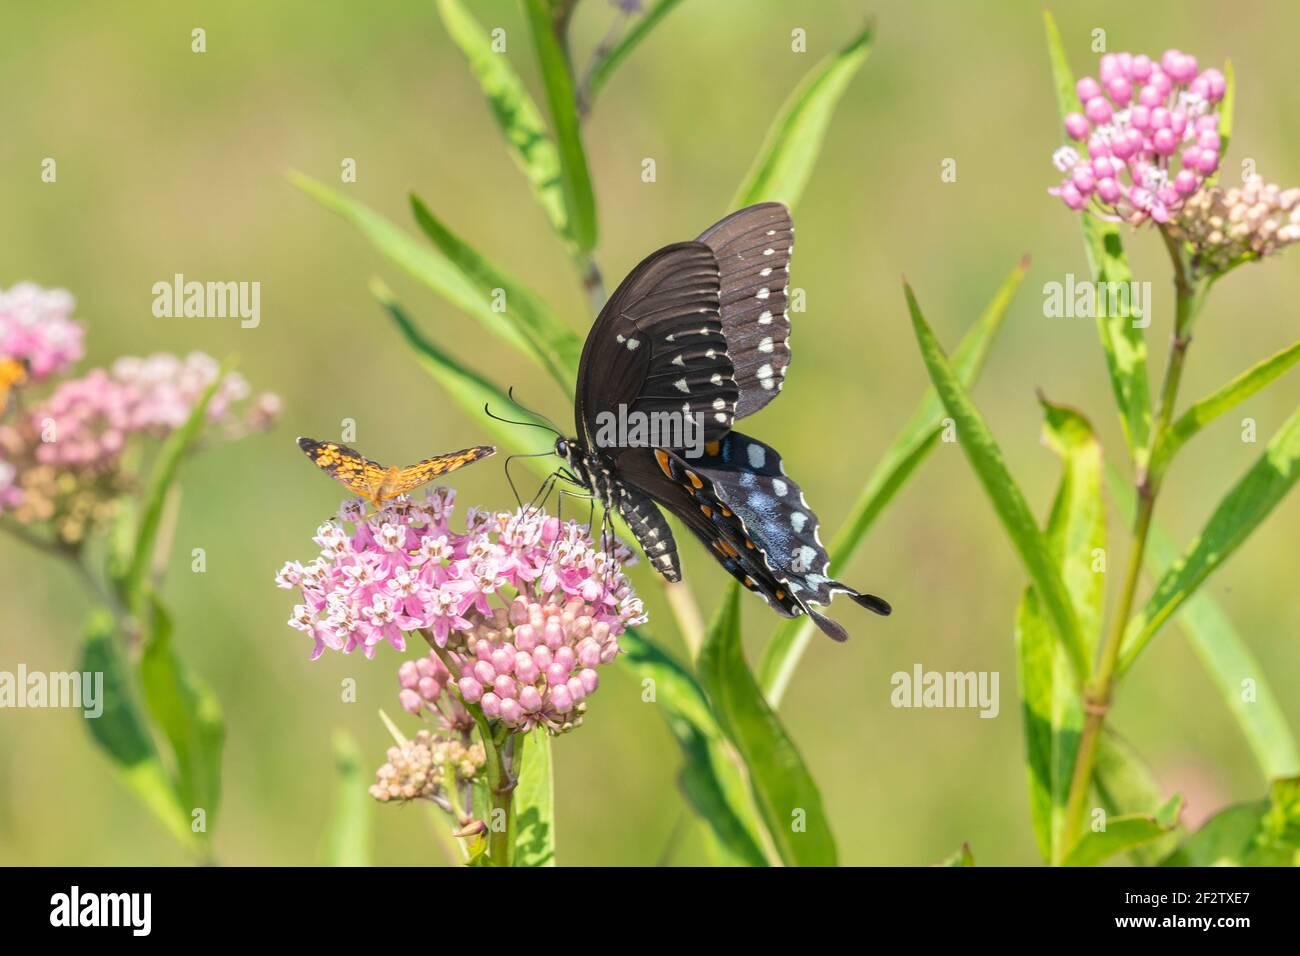 03029-01607 Picebush Swallowtail (Papilio troilus) en el pantano Milkweed (Asclepias incarnata) Marion Co. IL Foto de stock